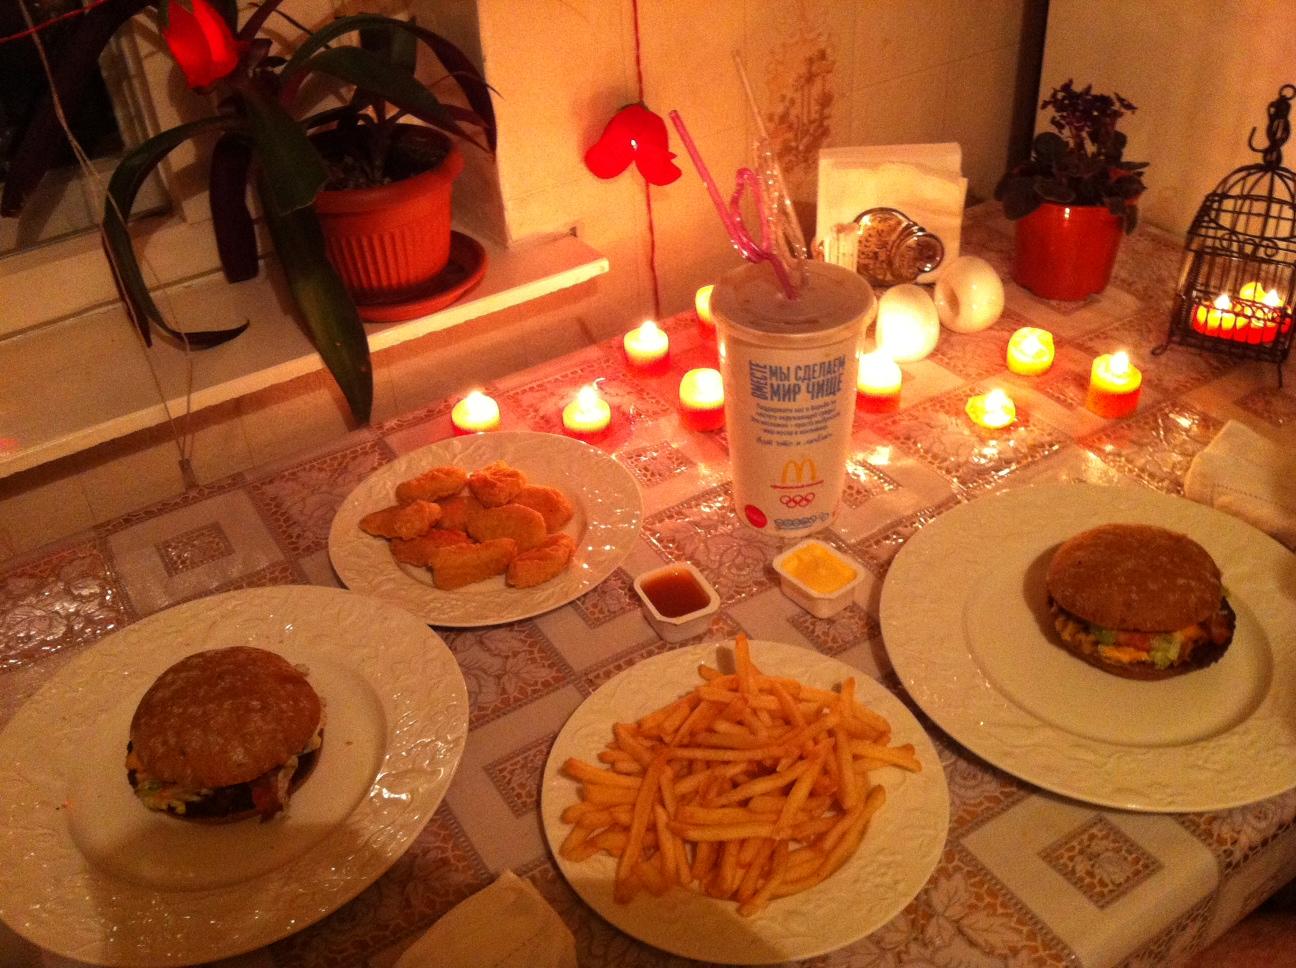 Романтический ужин для любимой в домашних условиях идеи фото